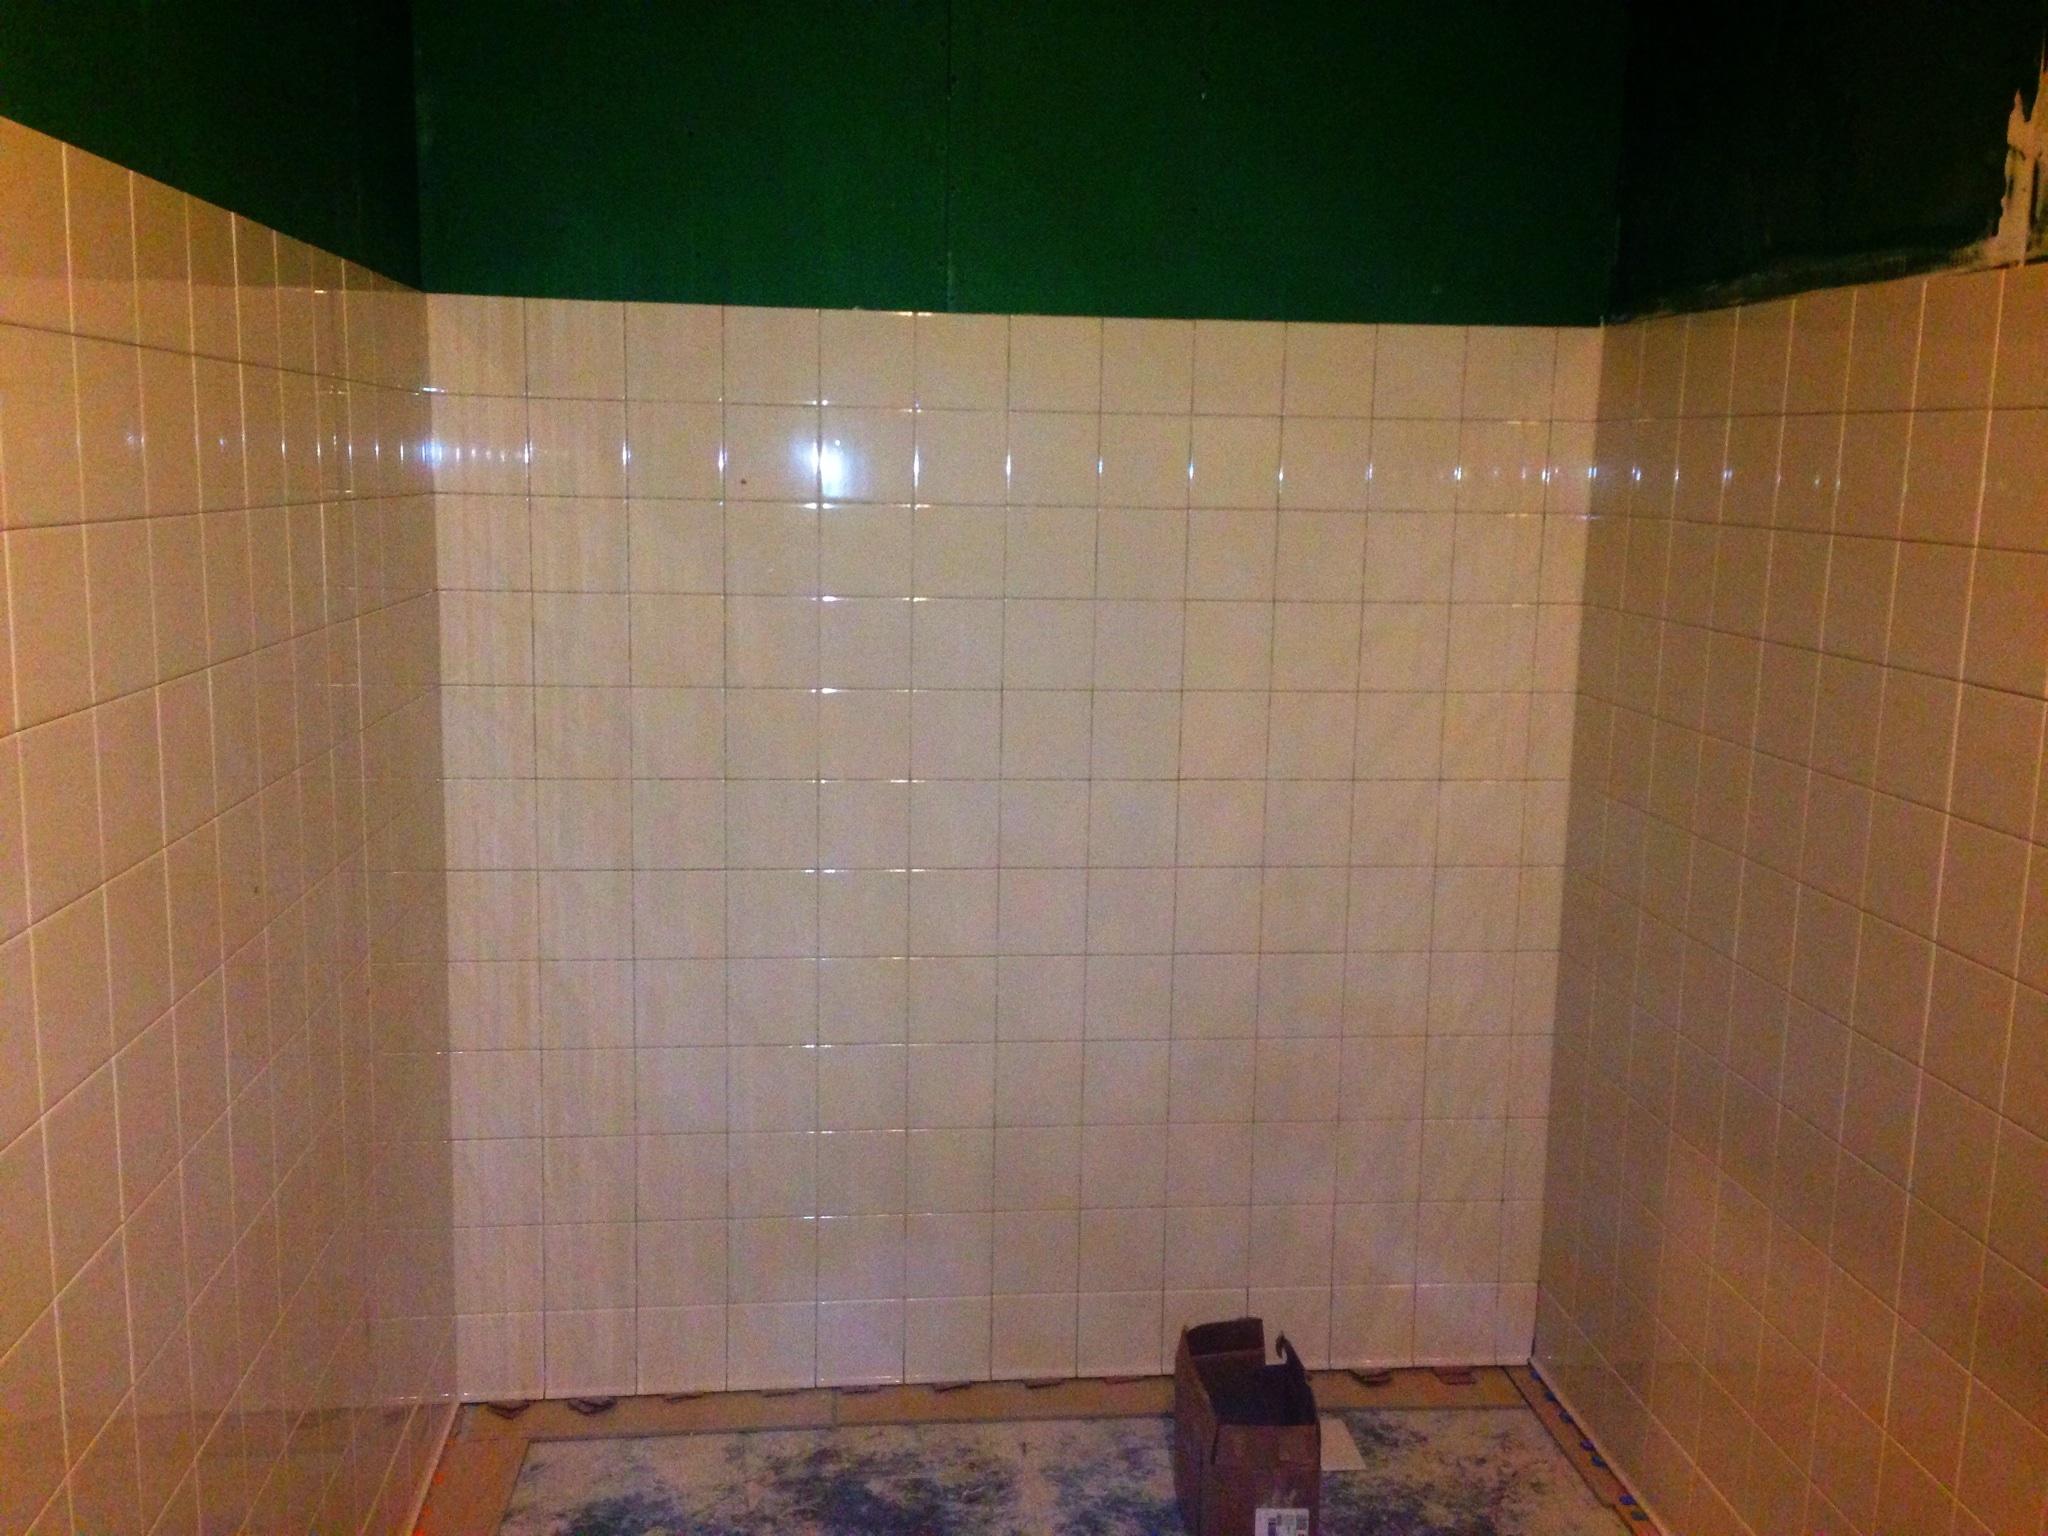 Lakeland flooring jobs march 2014 sunshine interiors carpet bathroom ceramic tile dailygadgetfo Image collections